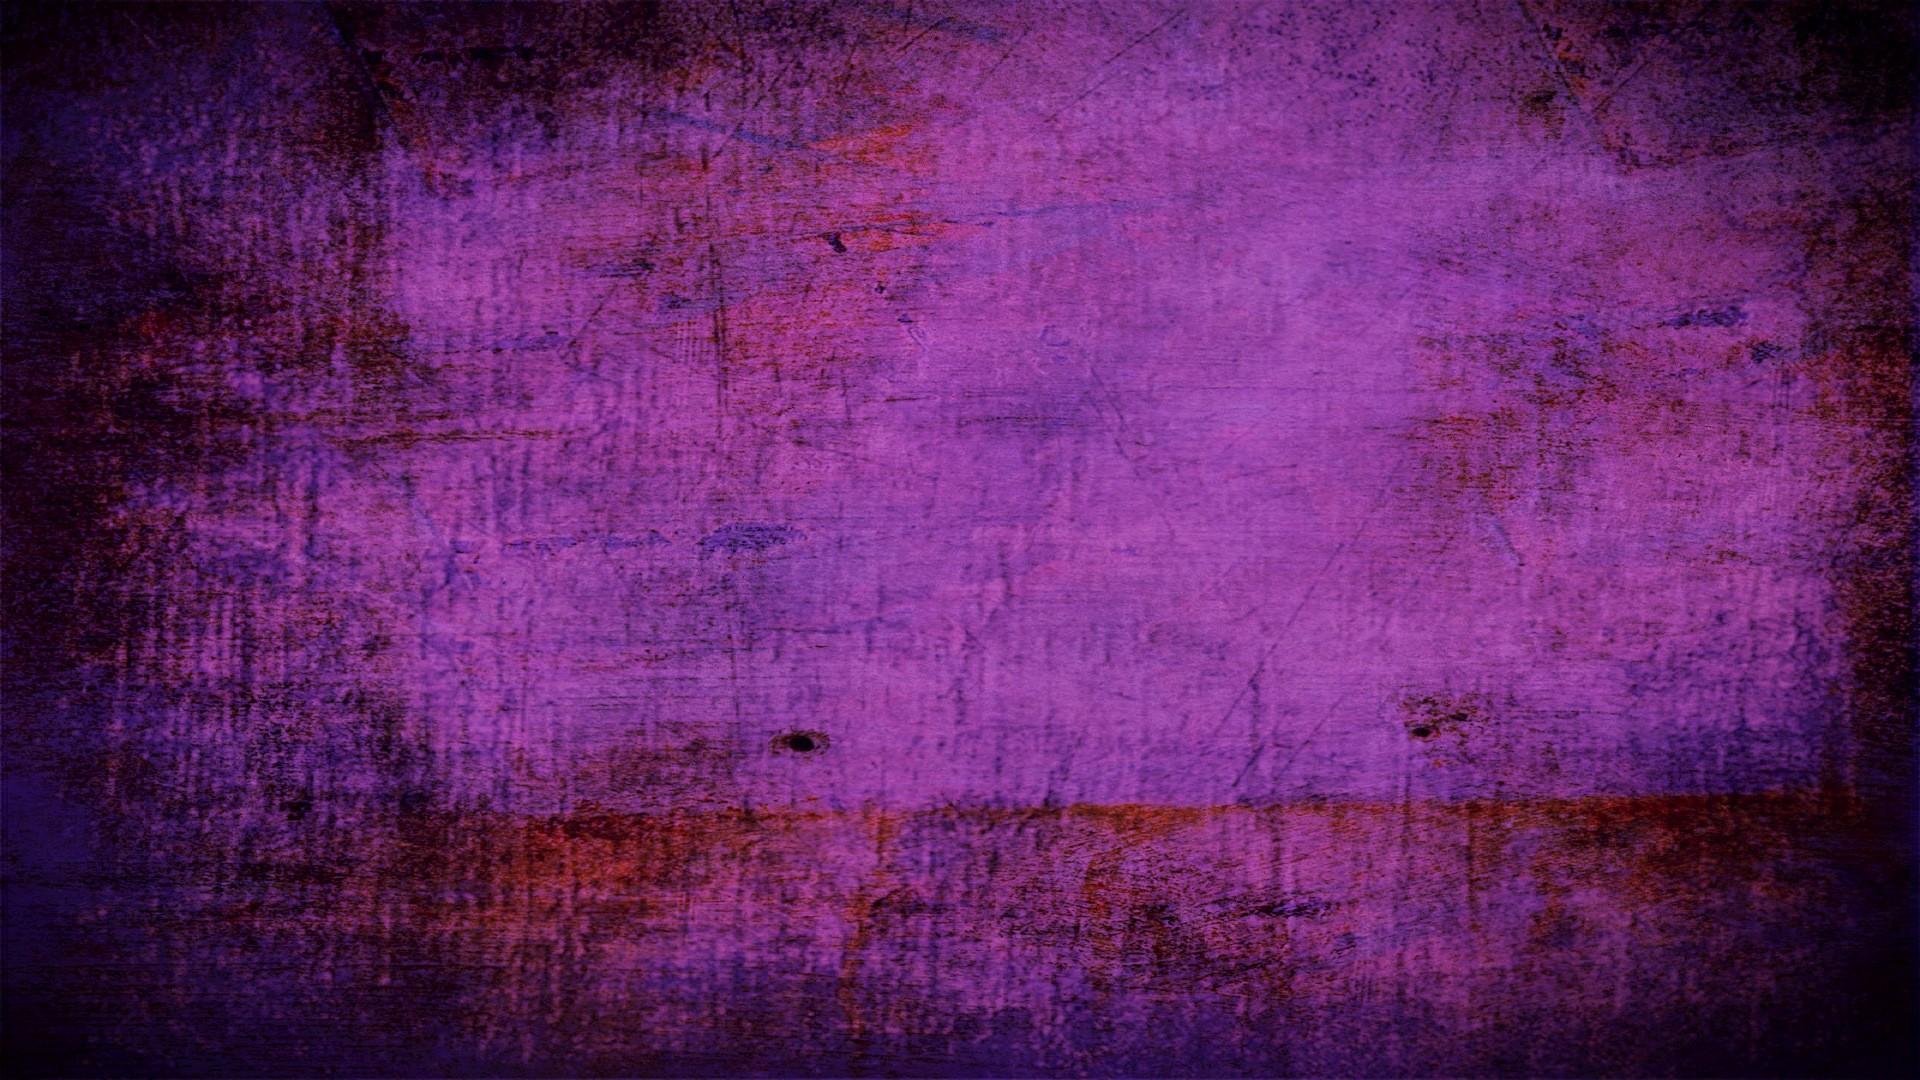 Purple Textured Backgrounds